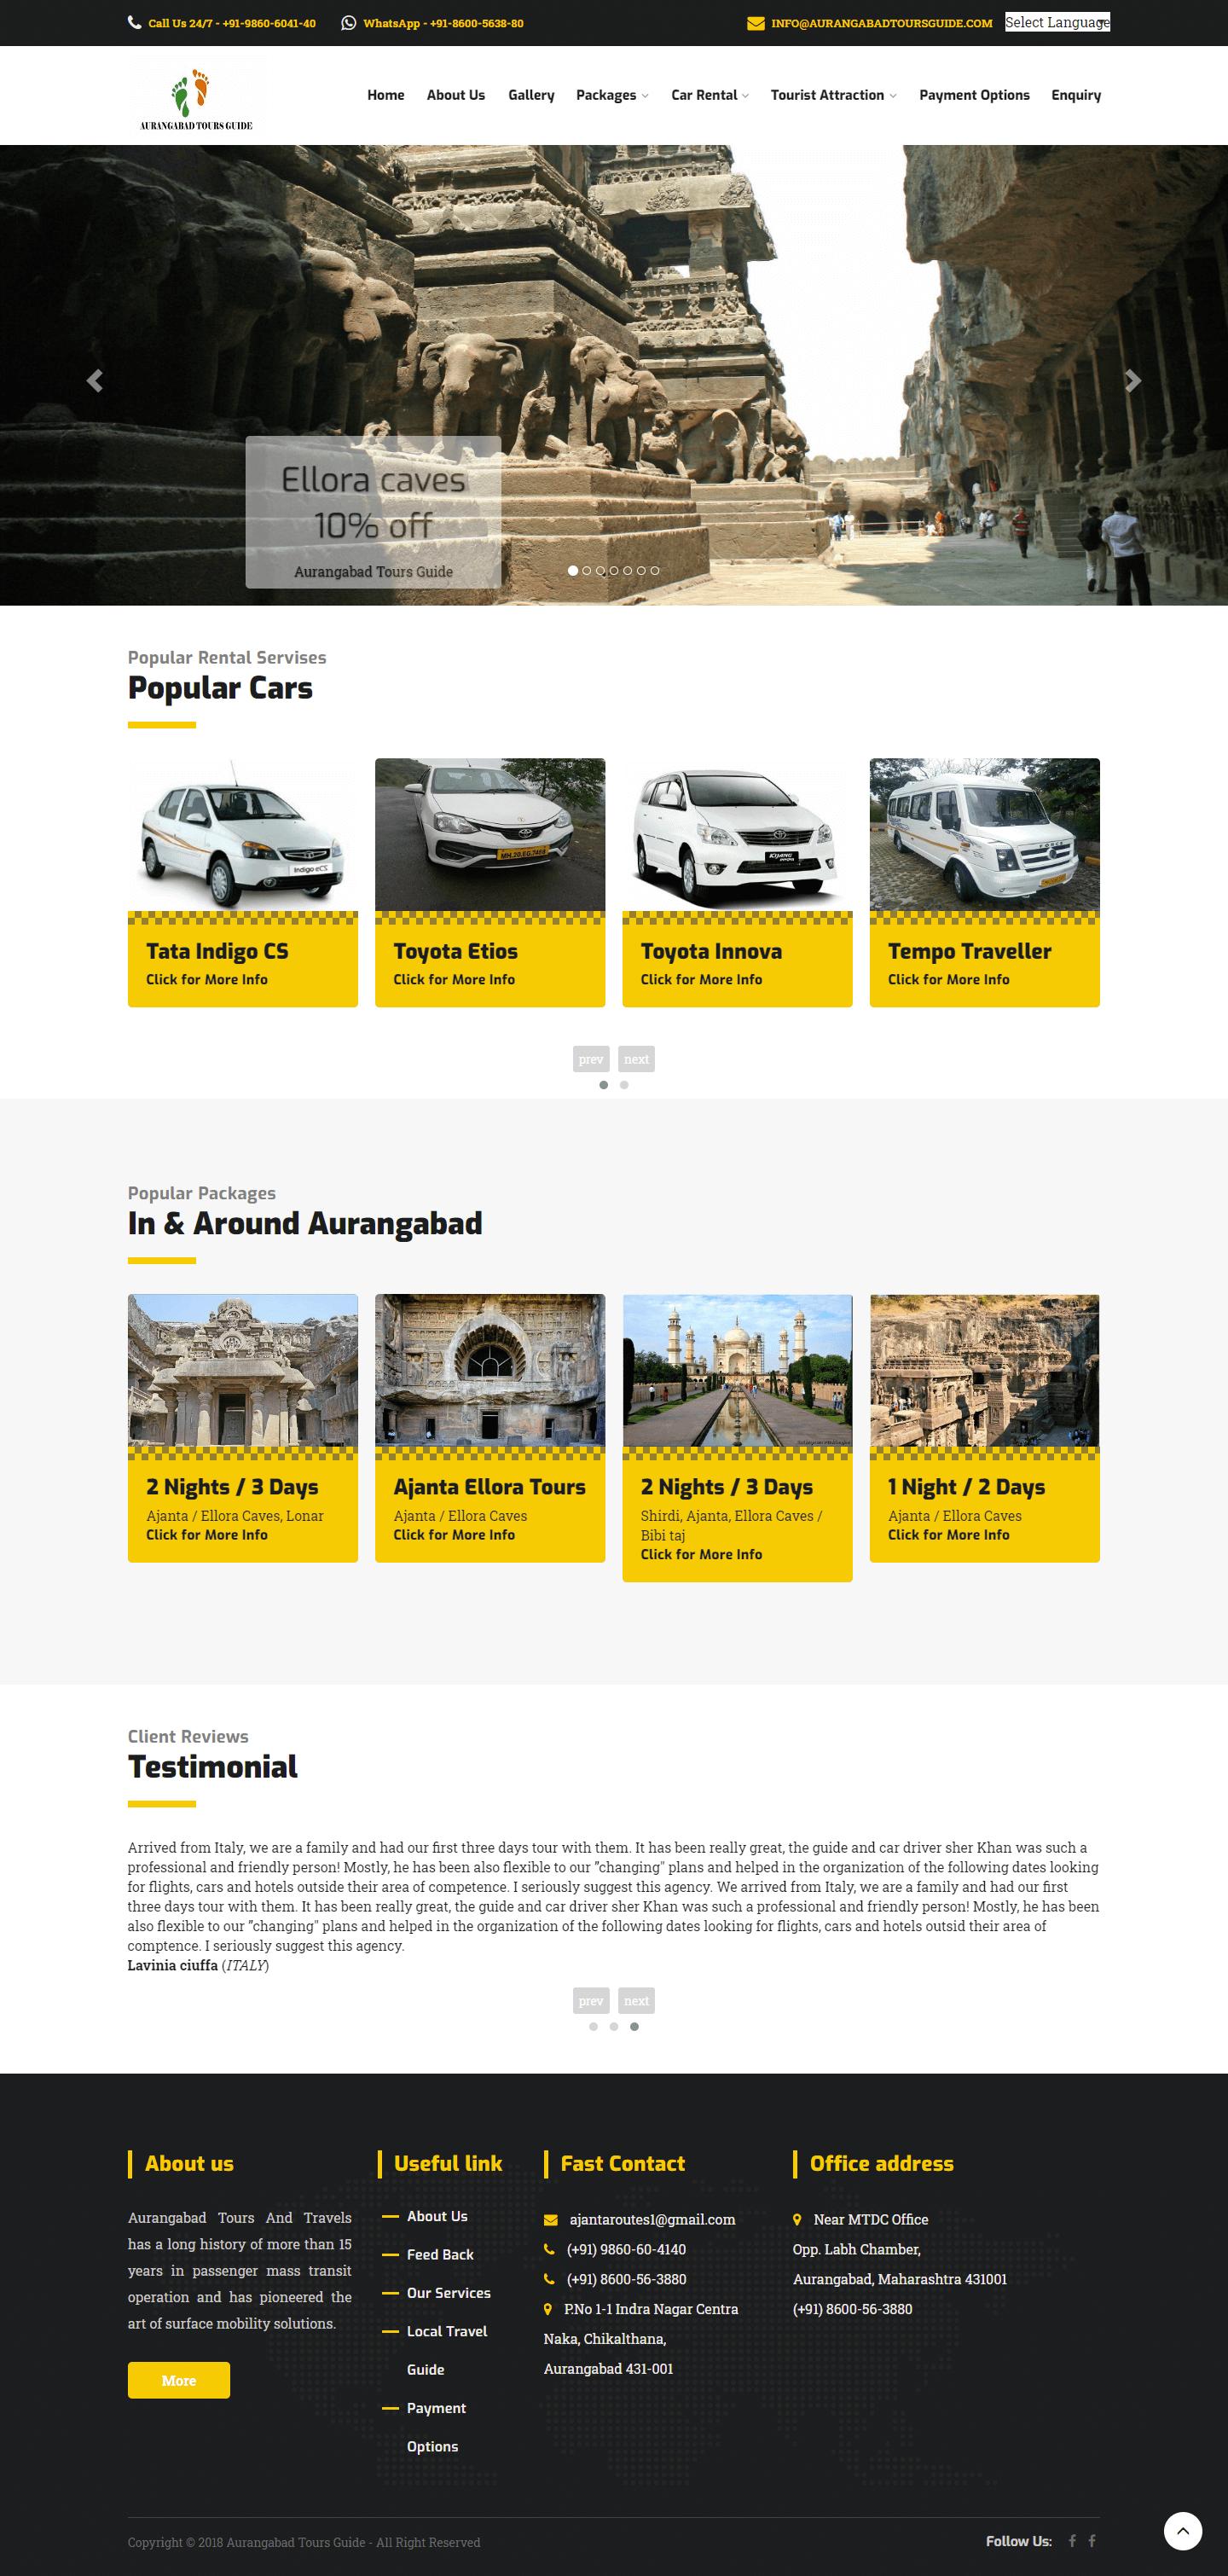 Aurangabad tour and travels